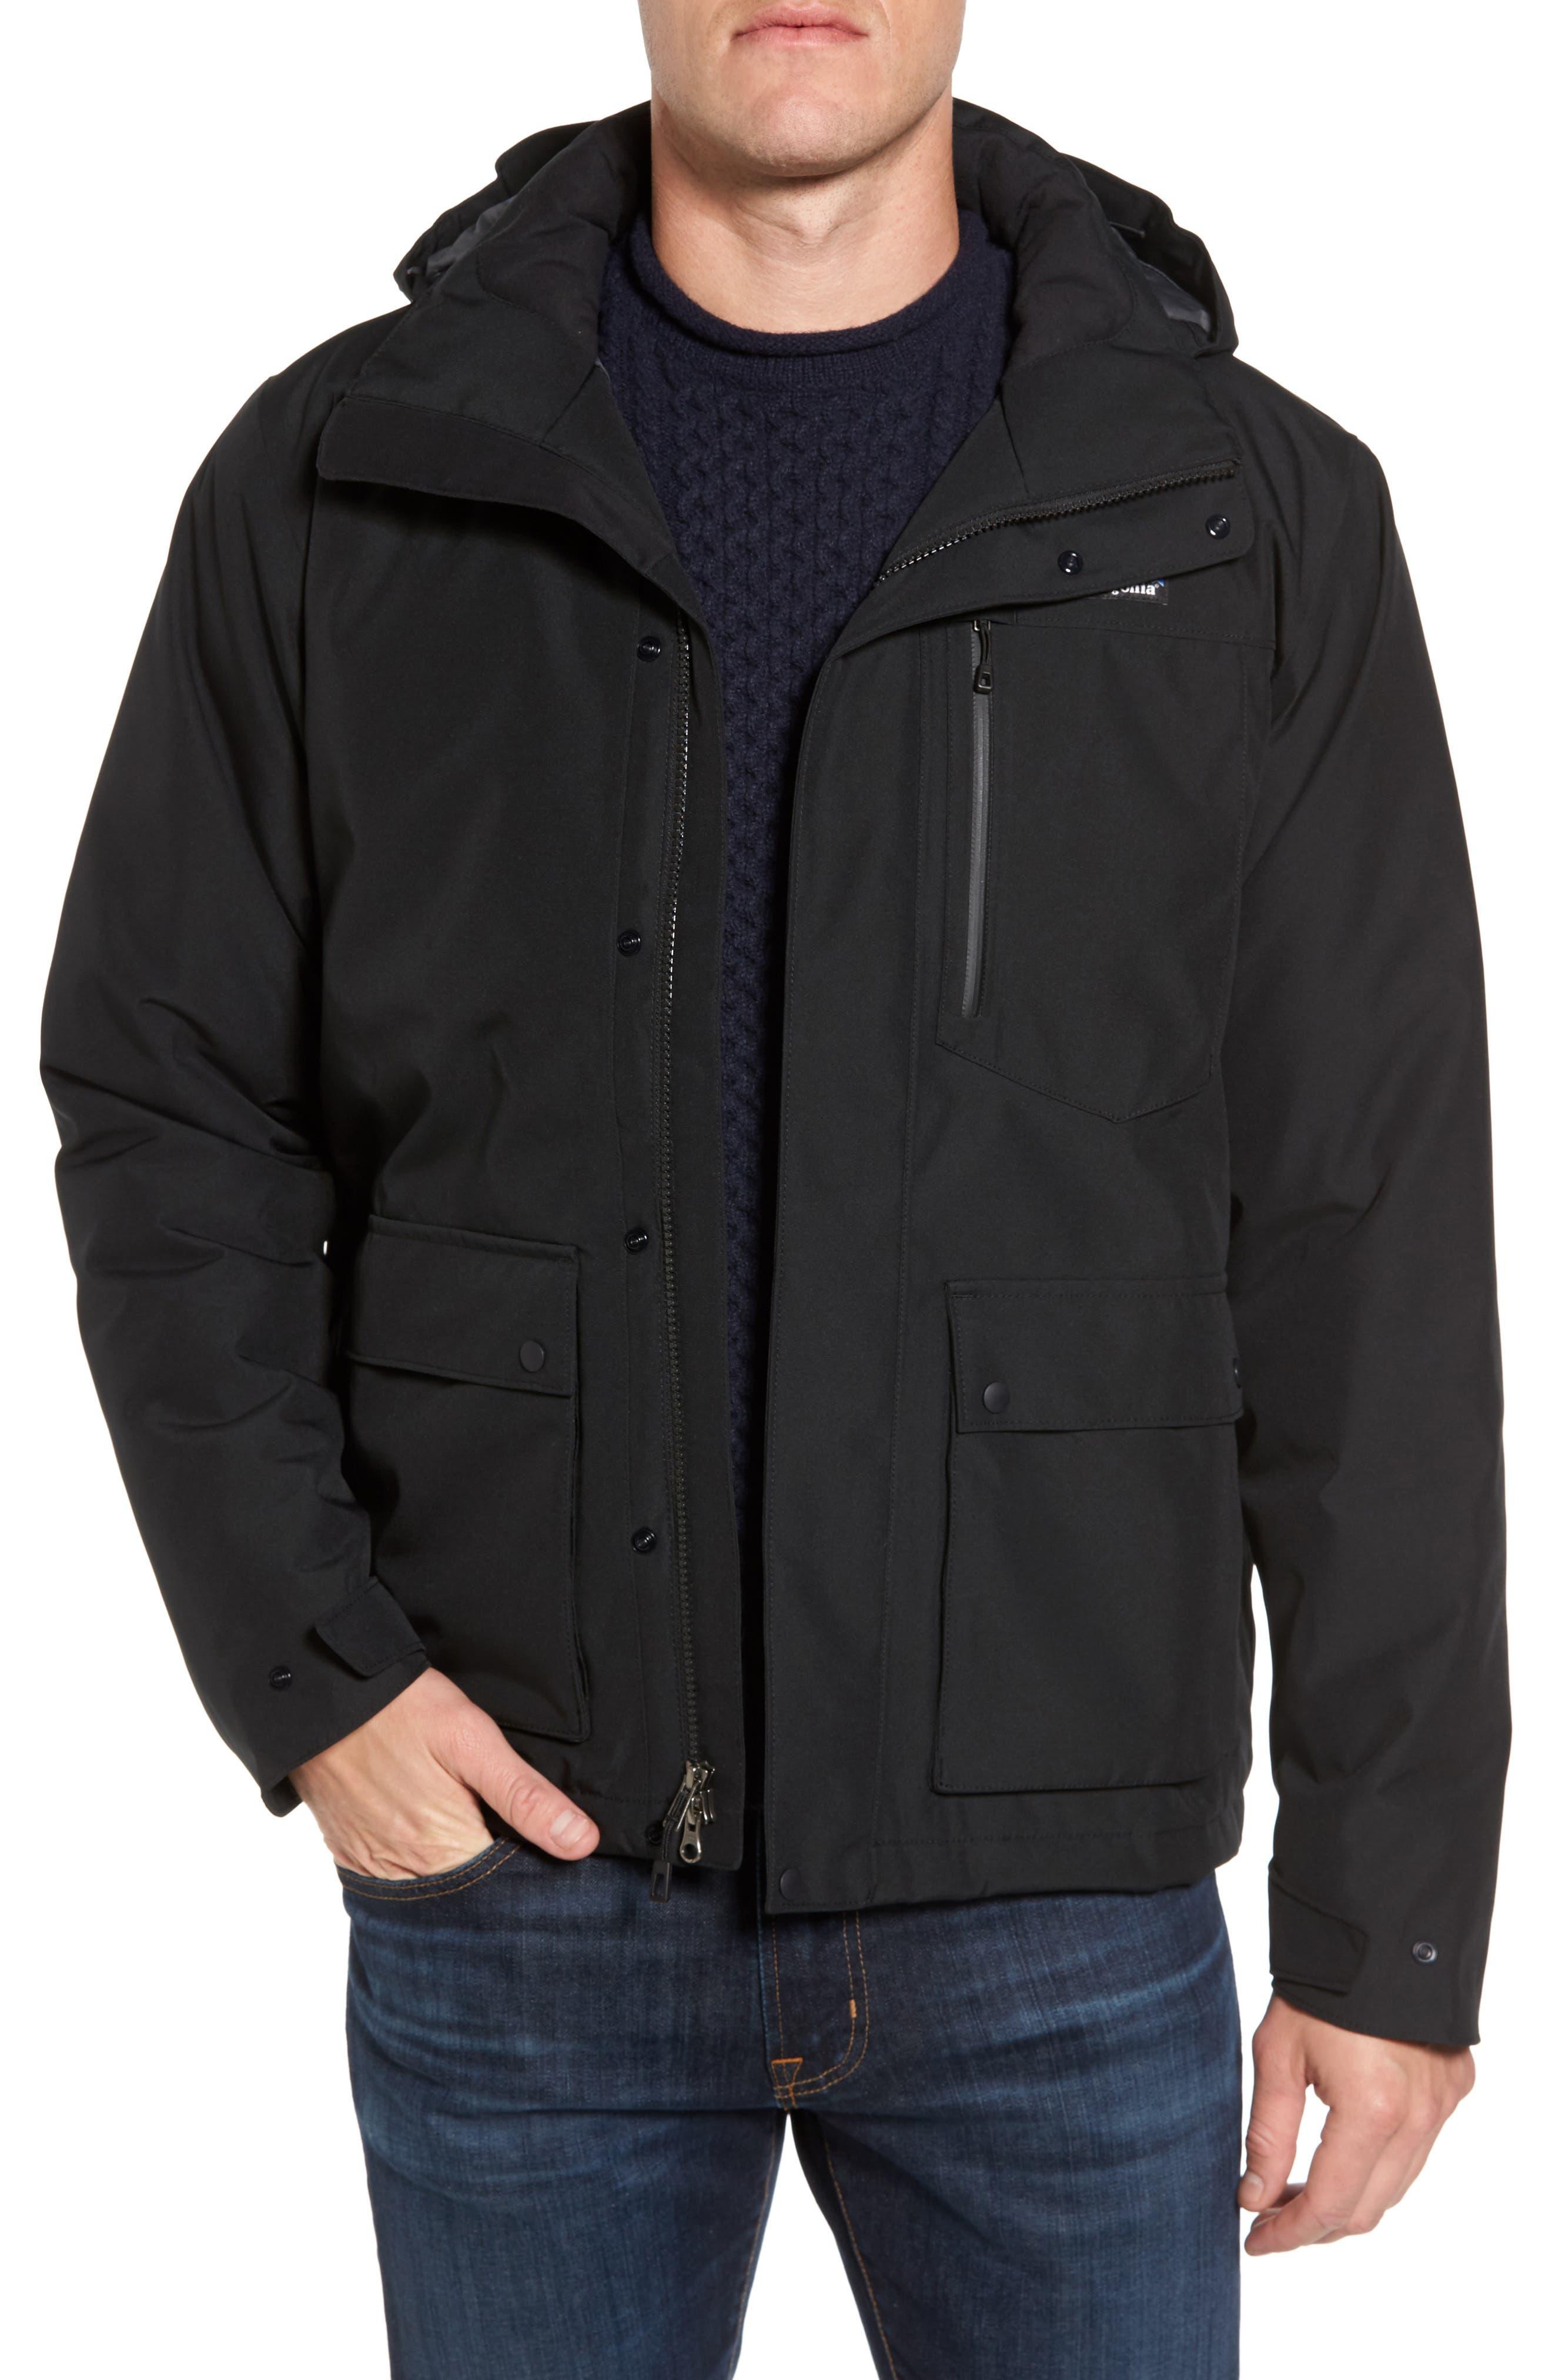 Topley Waterproof Down Jacket,                         Main,                         color, 001